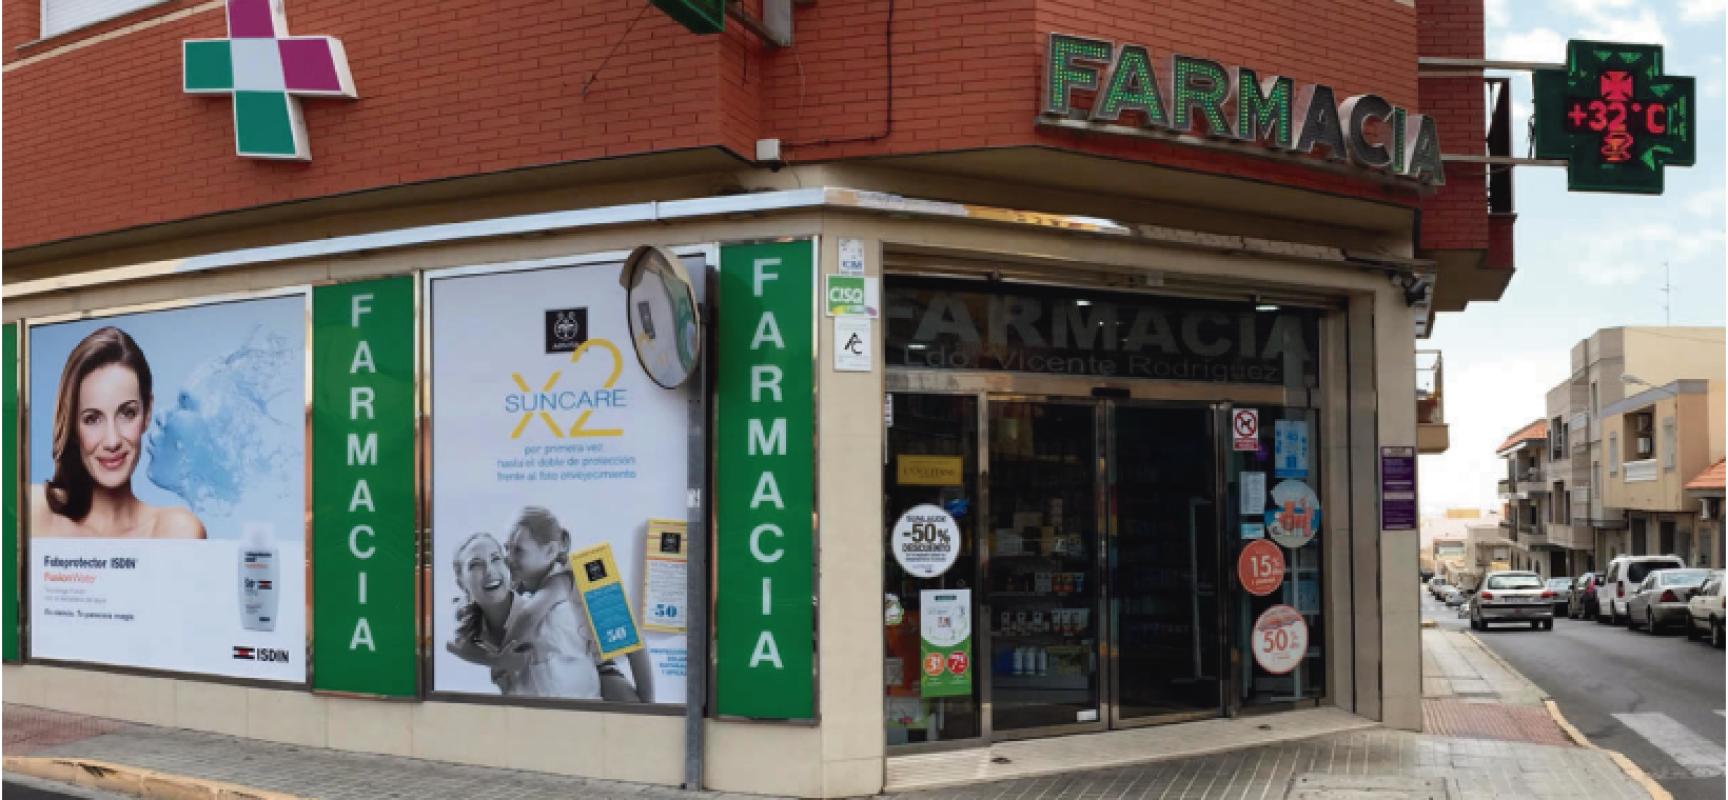 Farmacia Loma de la Mezquita: una botica de referencia